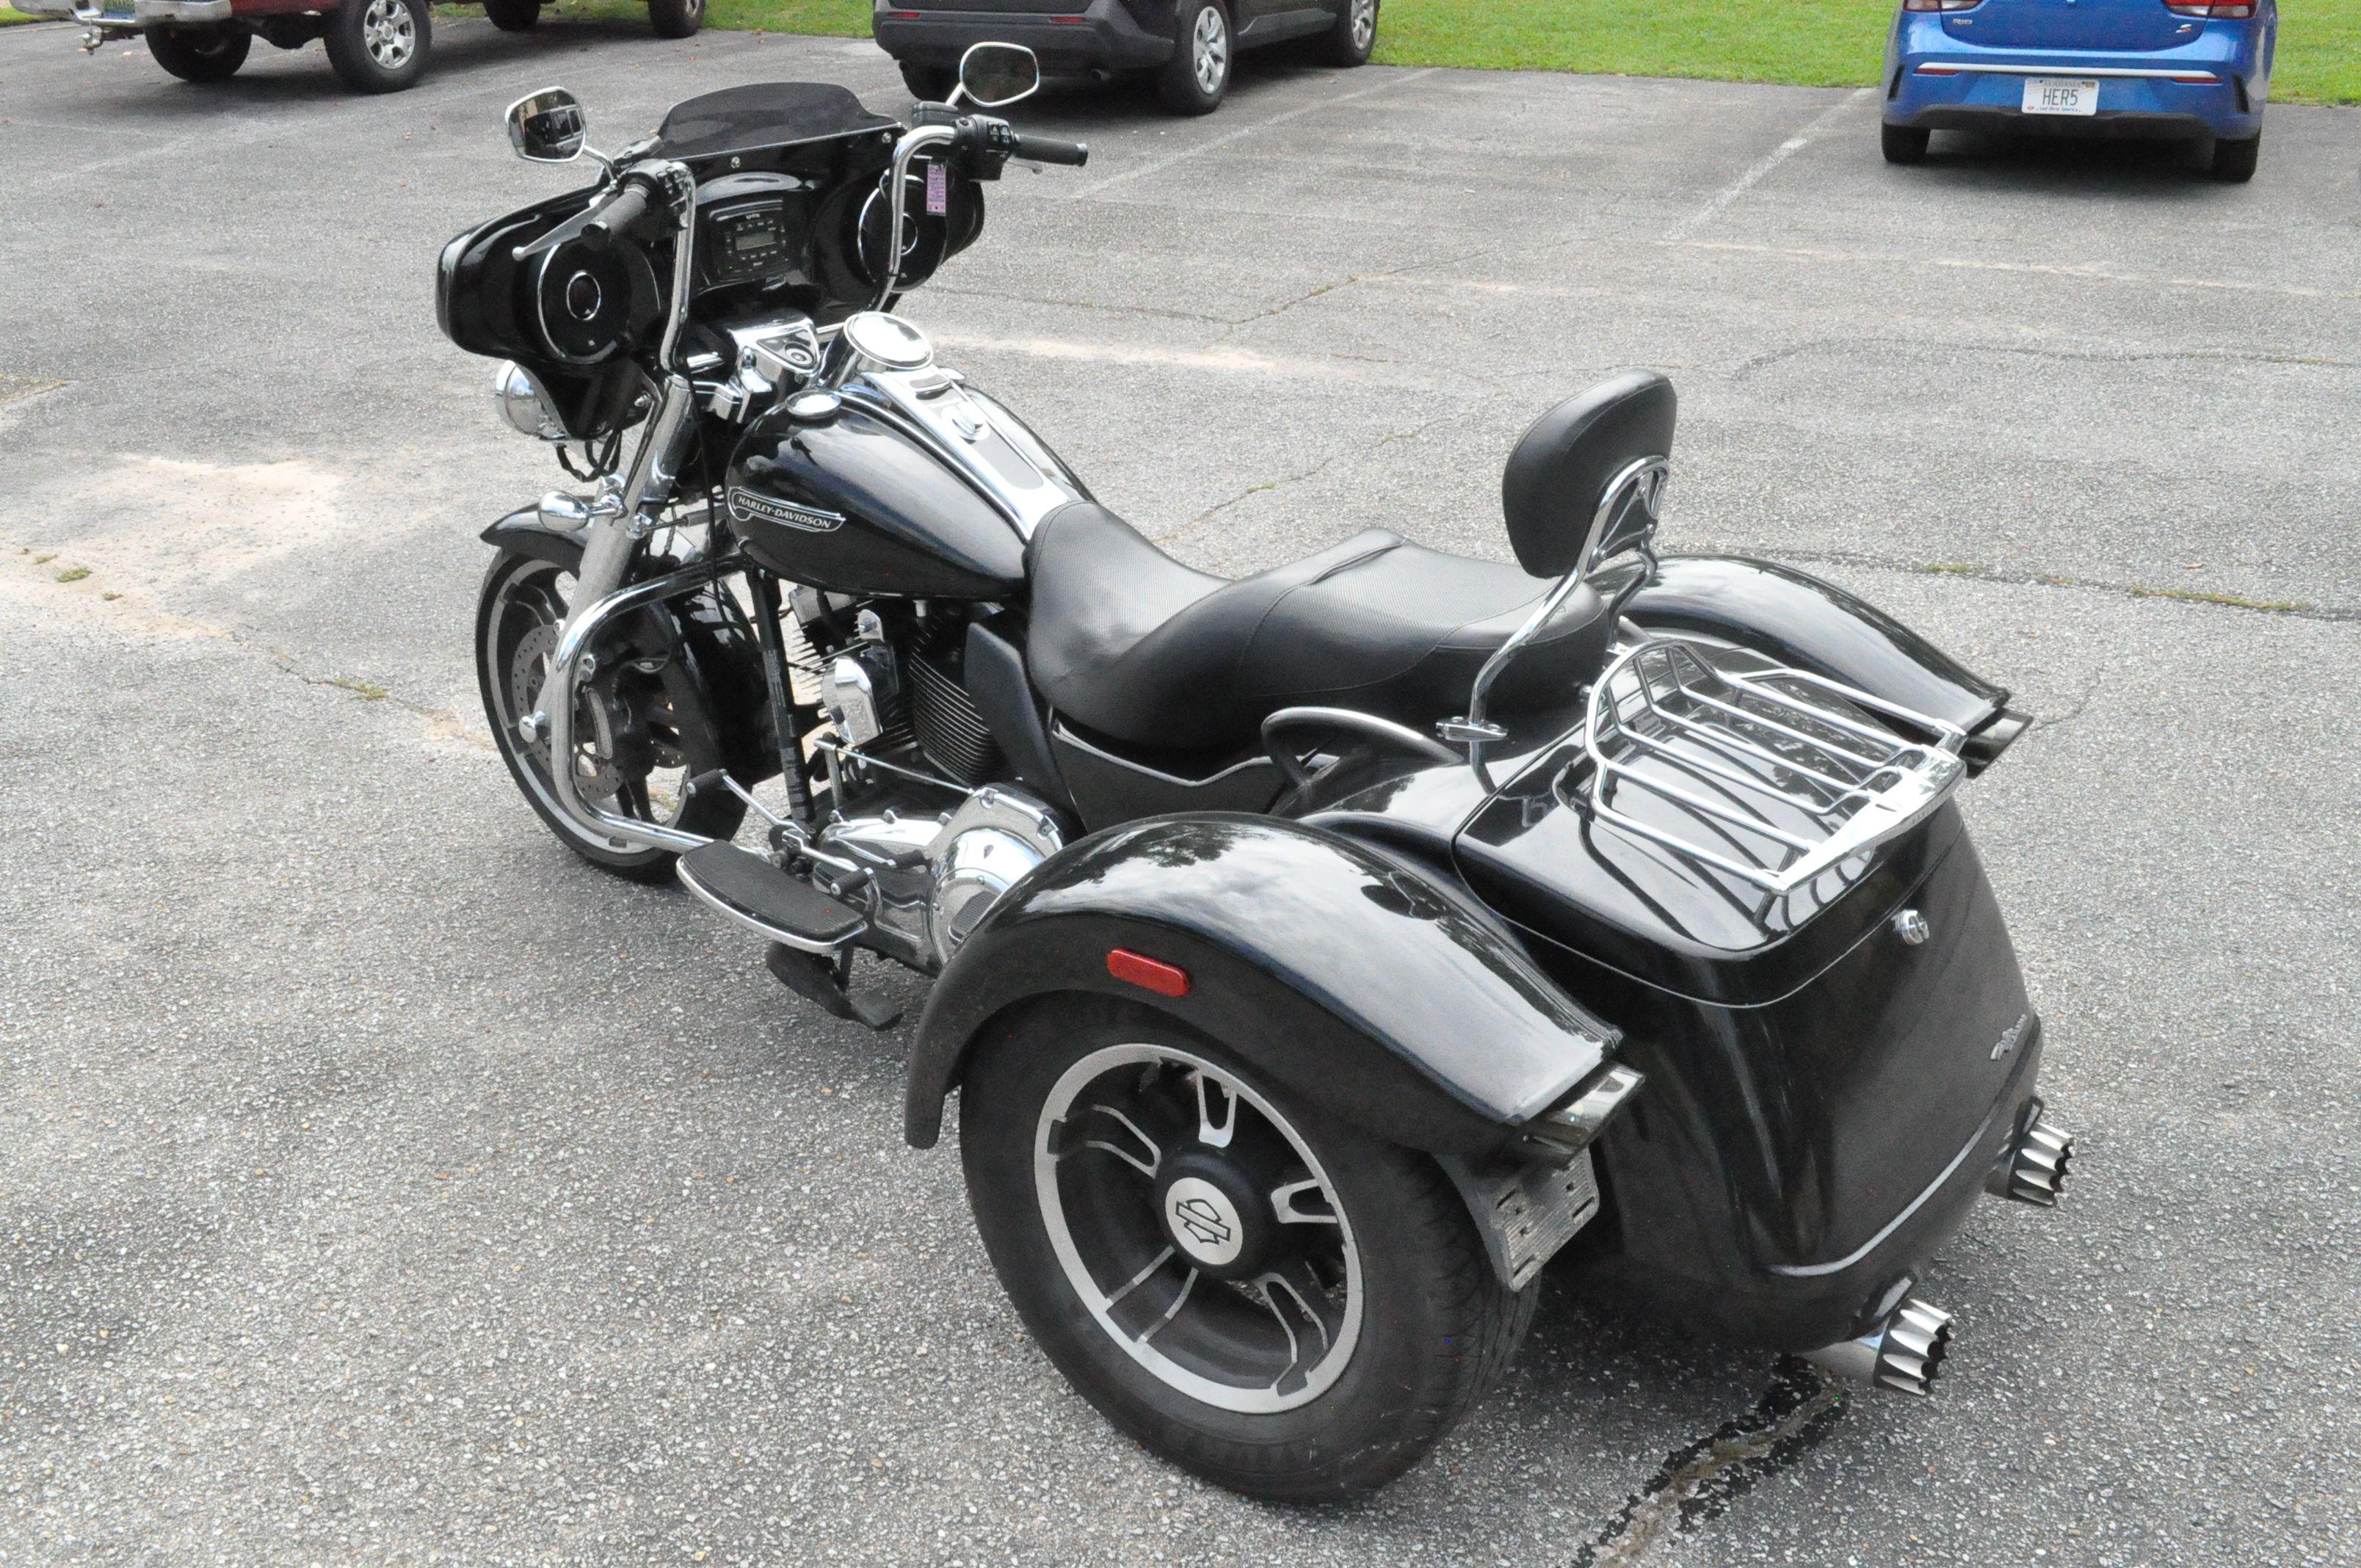 Pre-Owned 2016 Harley-Davidson Freewheeler FLRT